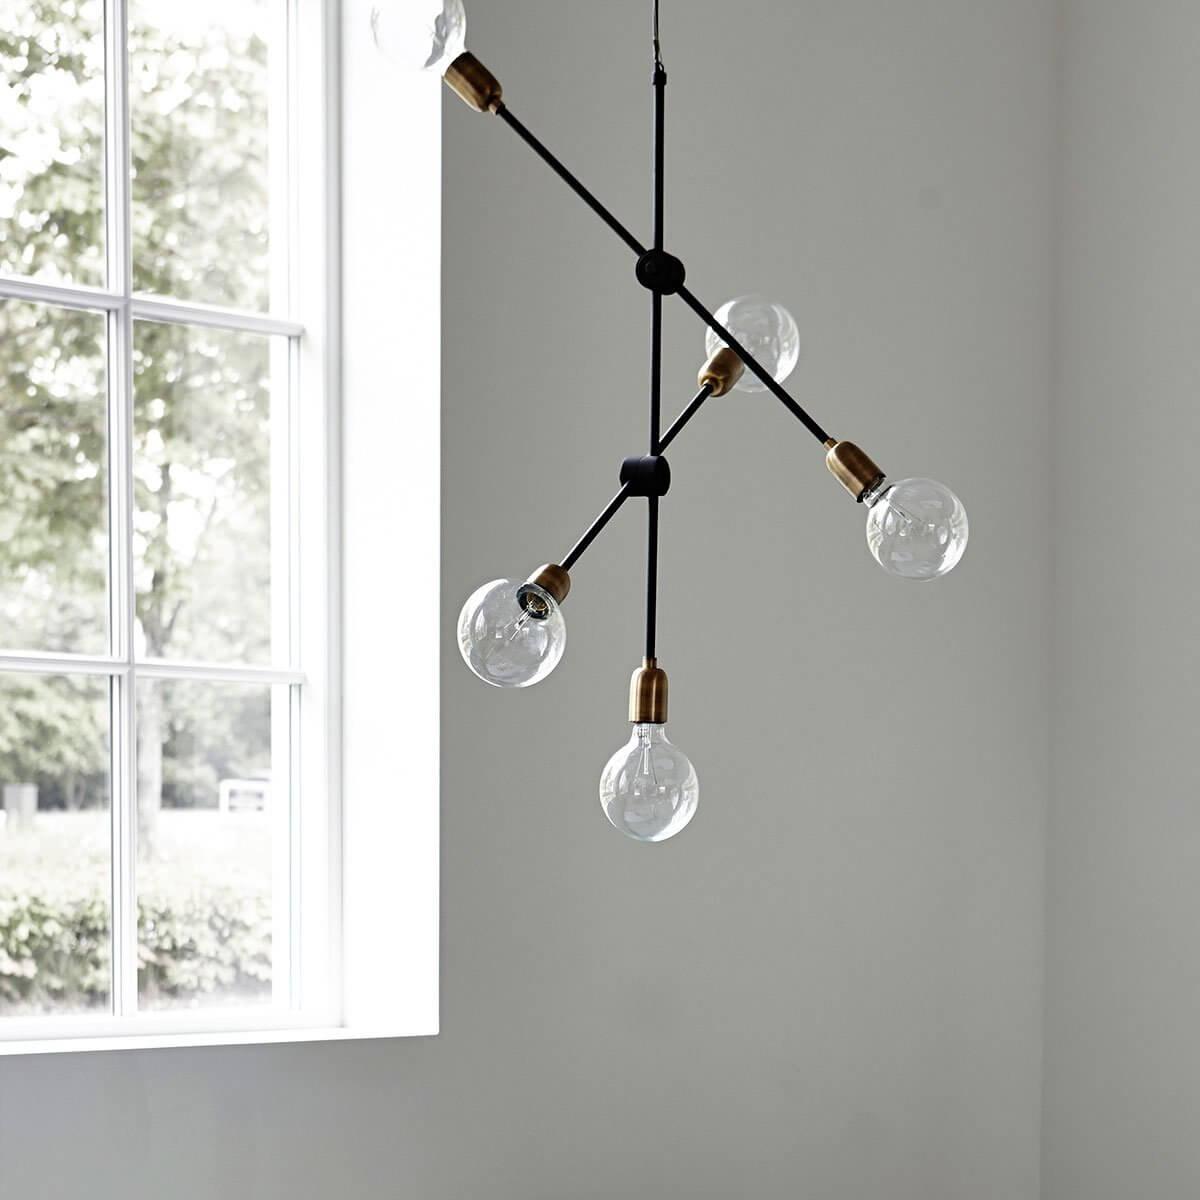 Molecular Lamp